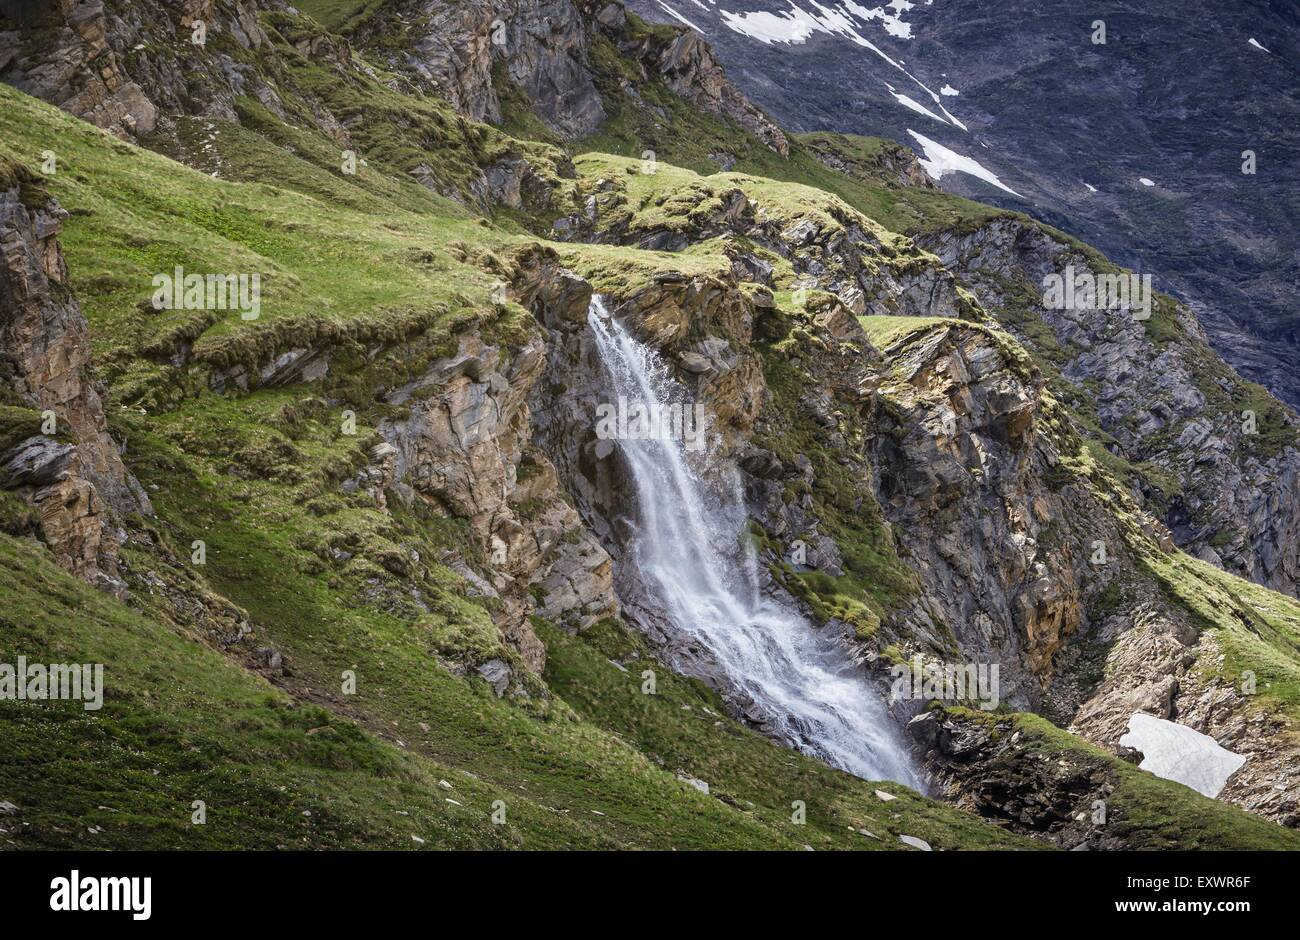 Waterfall, Hohe Tauern Nationalpark, Großglockner High Alpine Road, Austria, Europe - Stock Image